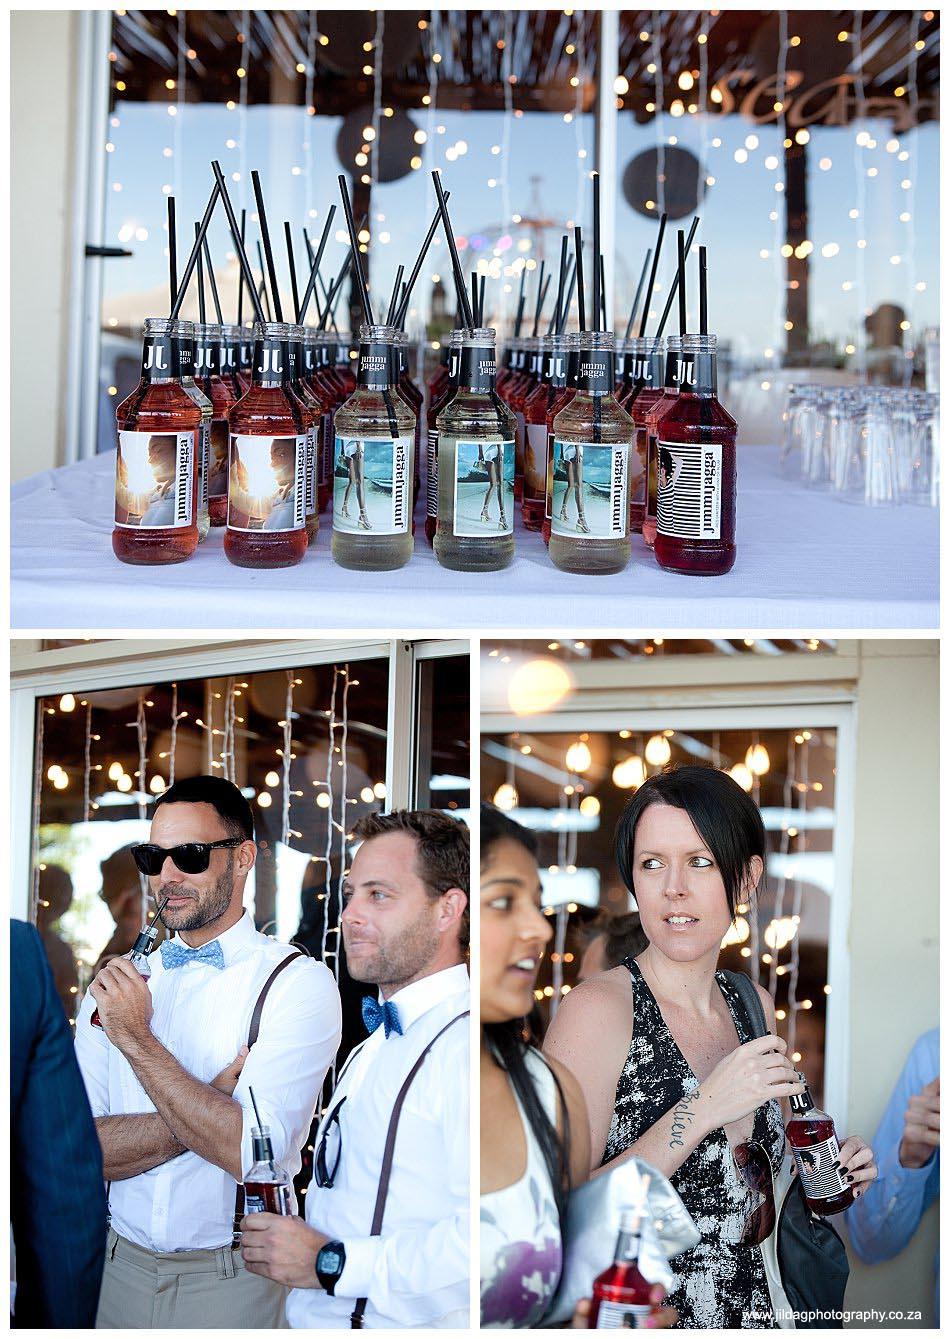 Seatrader, West coast beach wedding, Romy & Clynt (38)